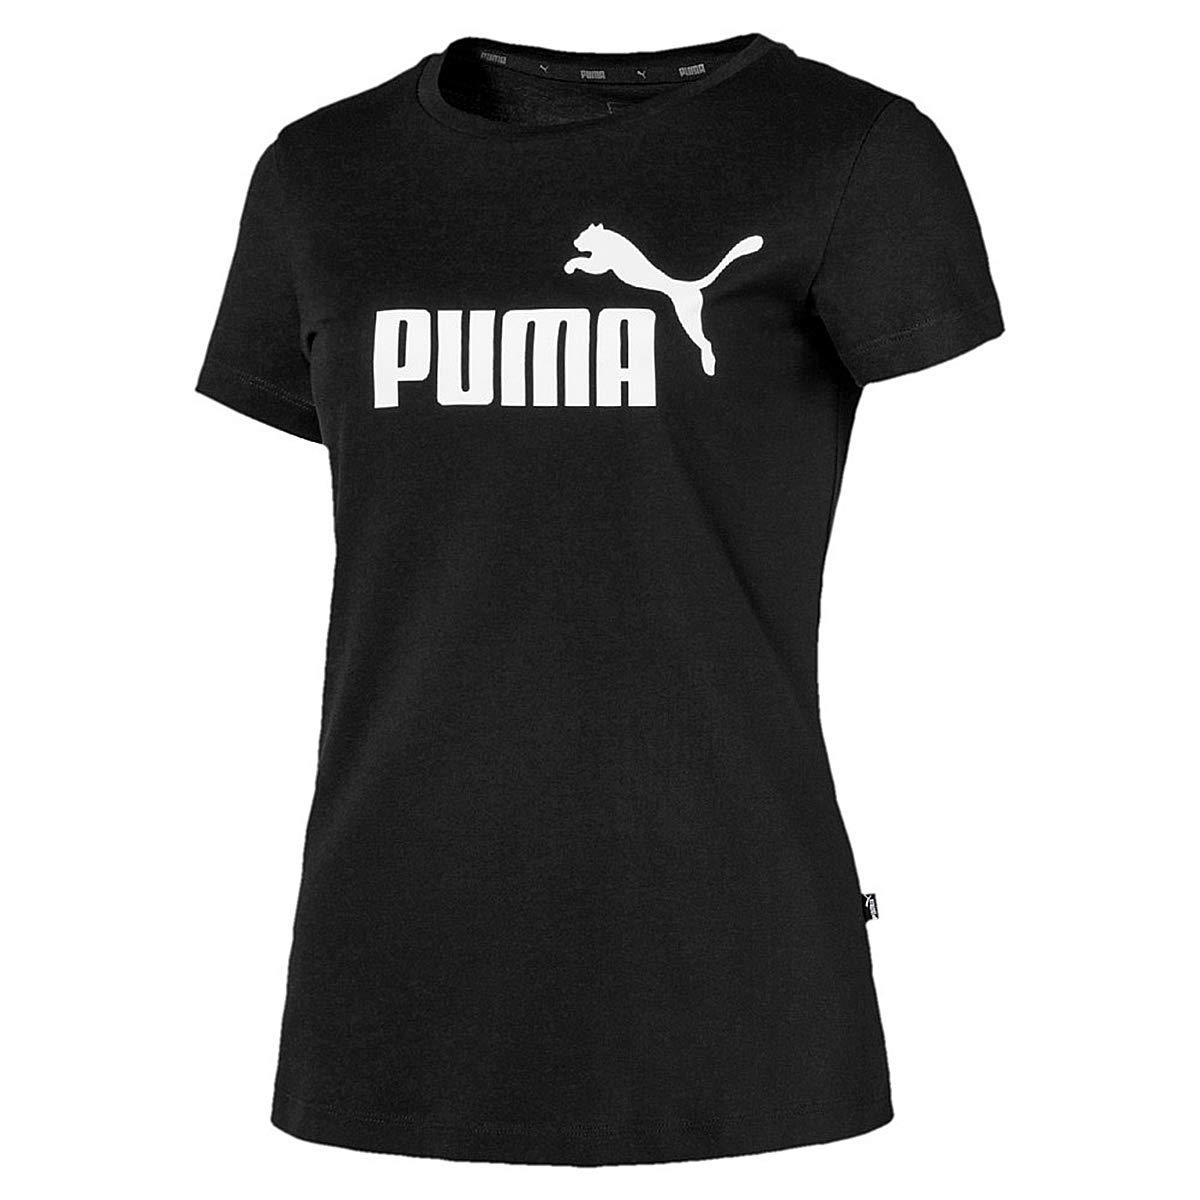 8e9c5b85 Amazon.com: PUMA Women ESS Essential Logo Tee black T-shirt 851787 01:  Clothing